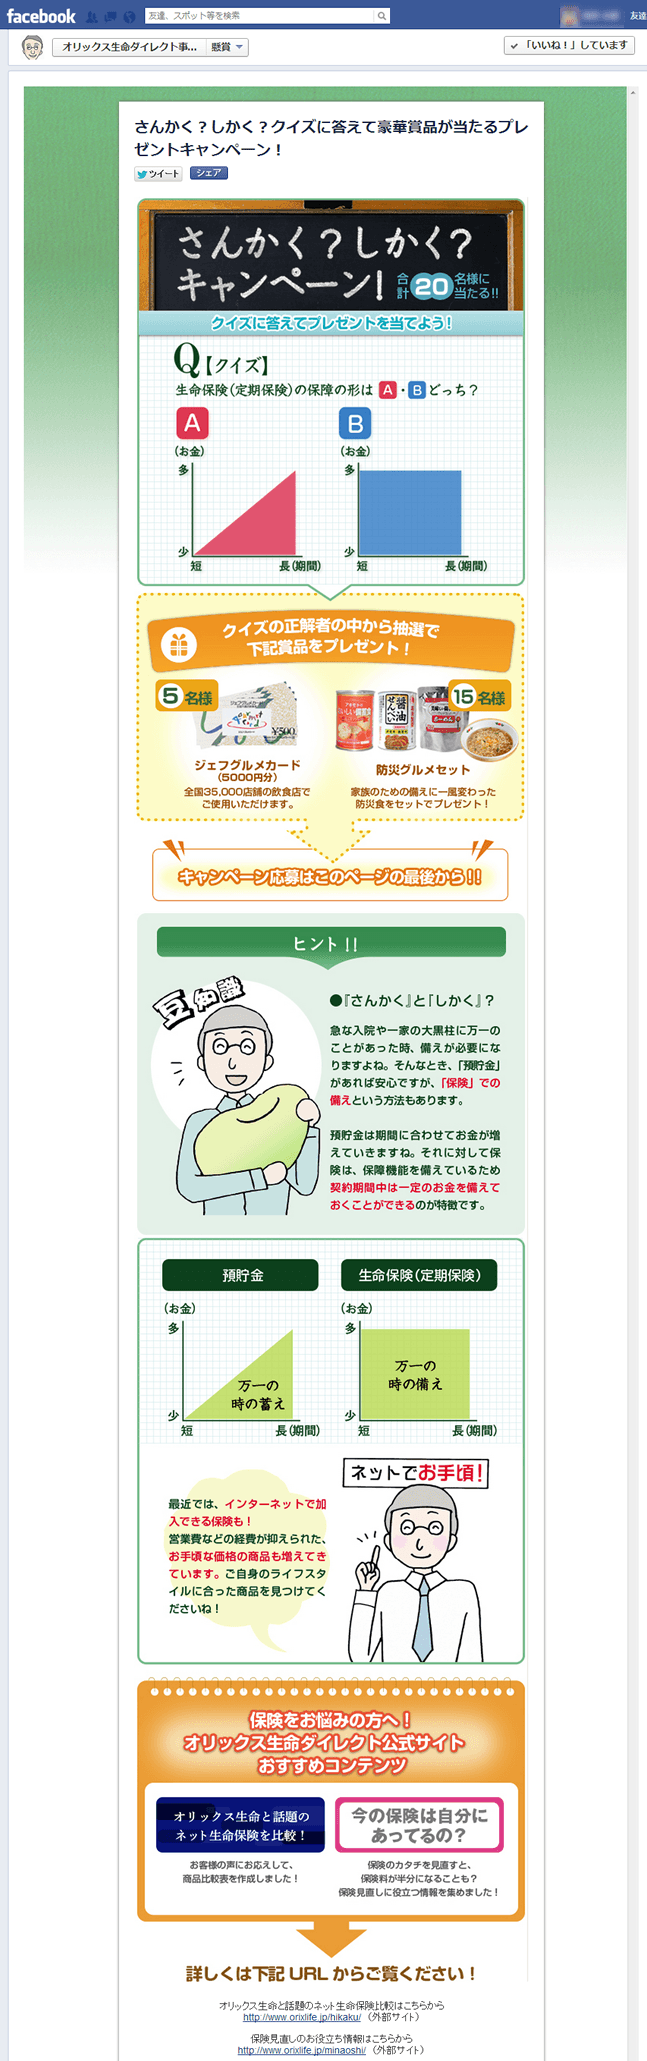 Fantastics 「クイズ型」懸賞キャンペーンアプリ(オリックス生命様)